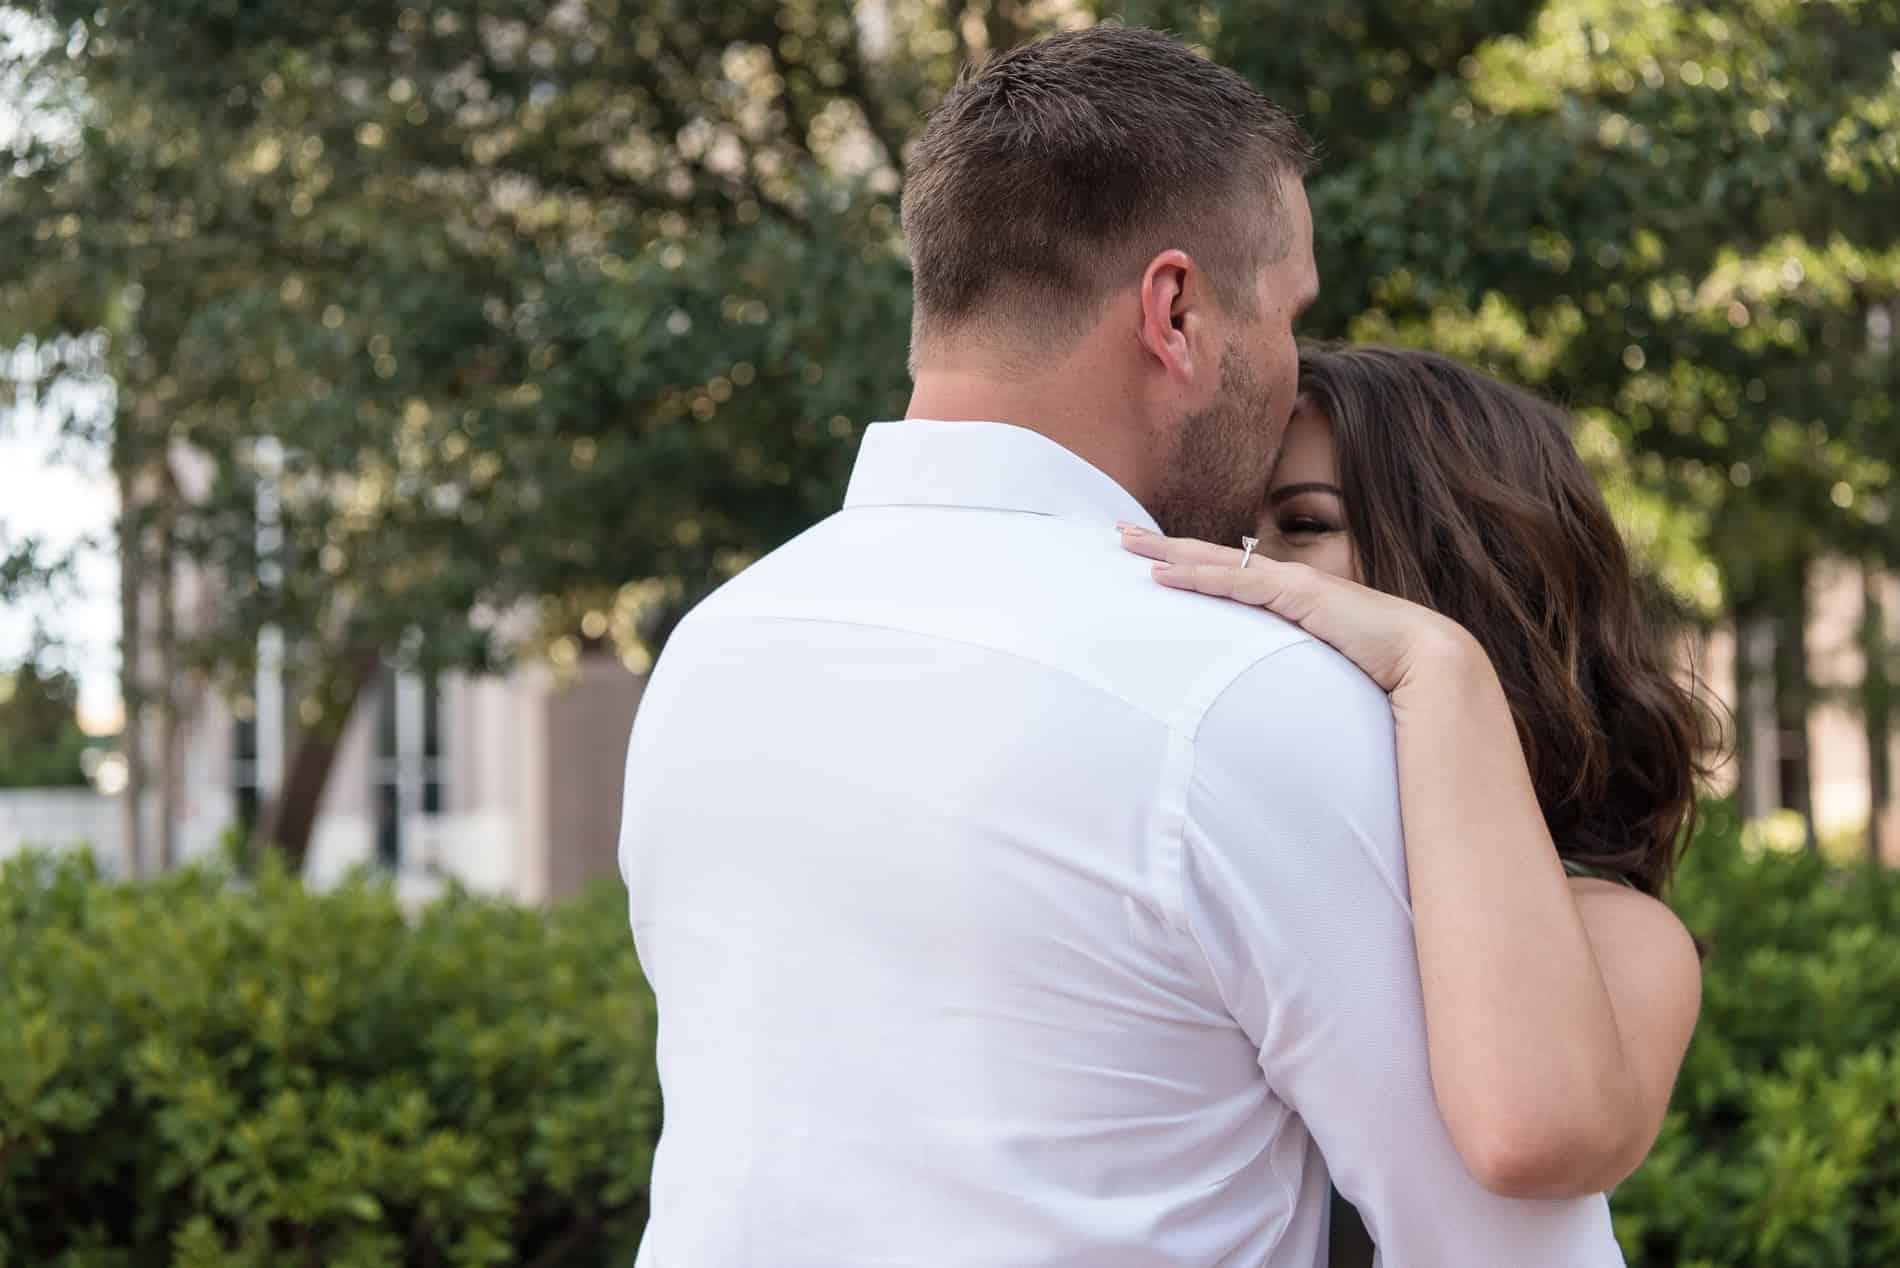 She hugs her fiance as he kisses her